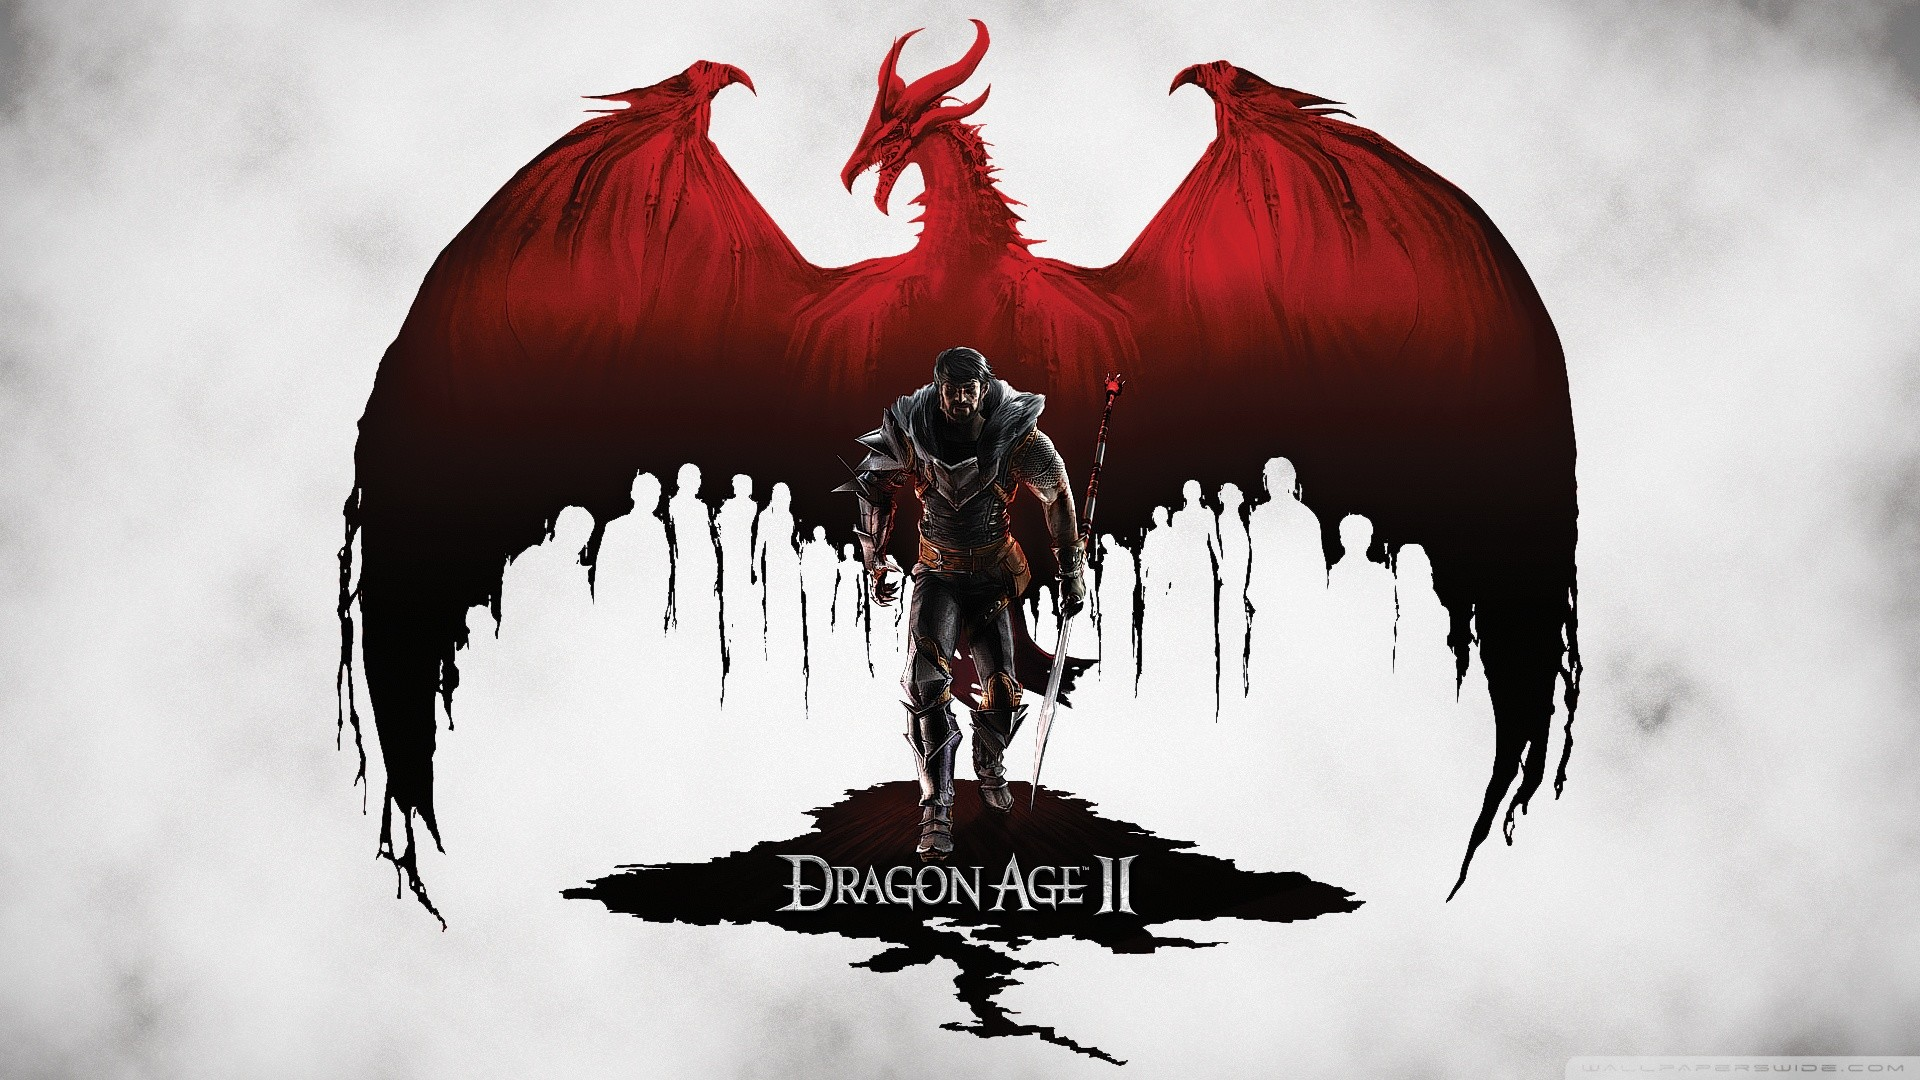 Dragon Age II HD Wide Wallpaper for Widescreen